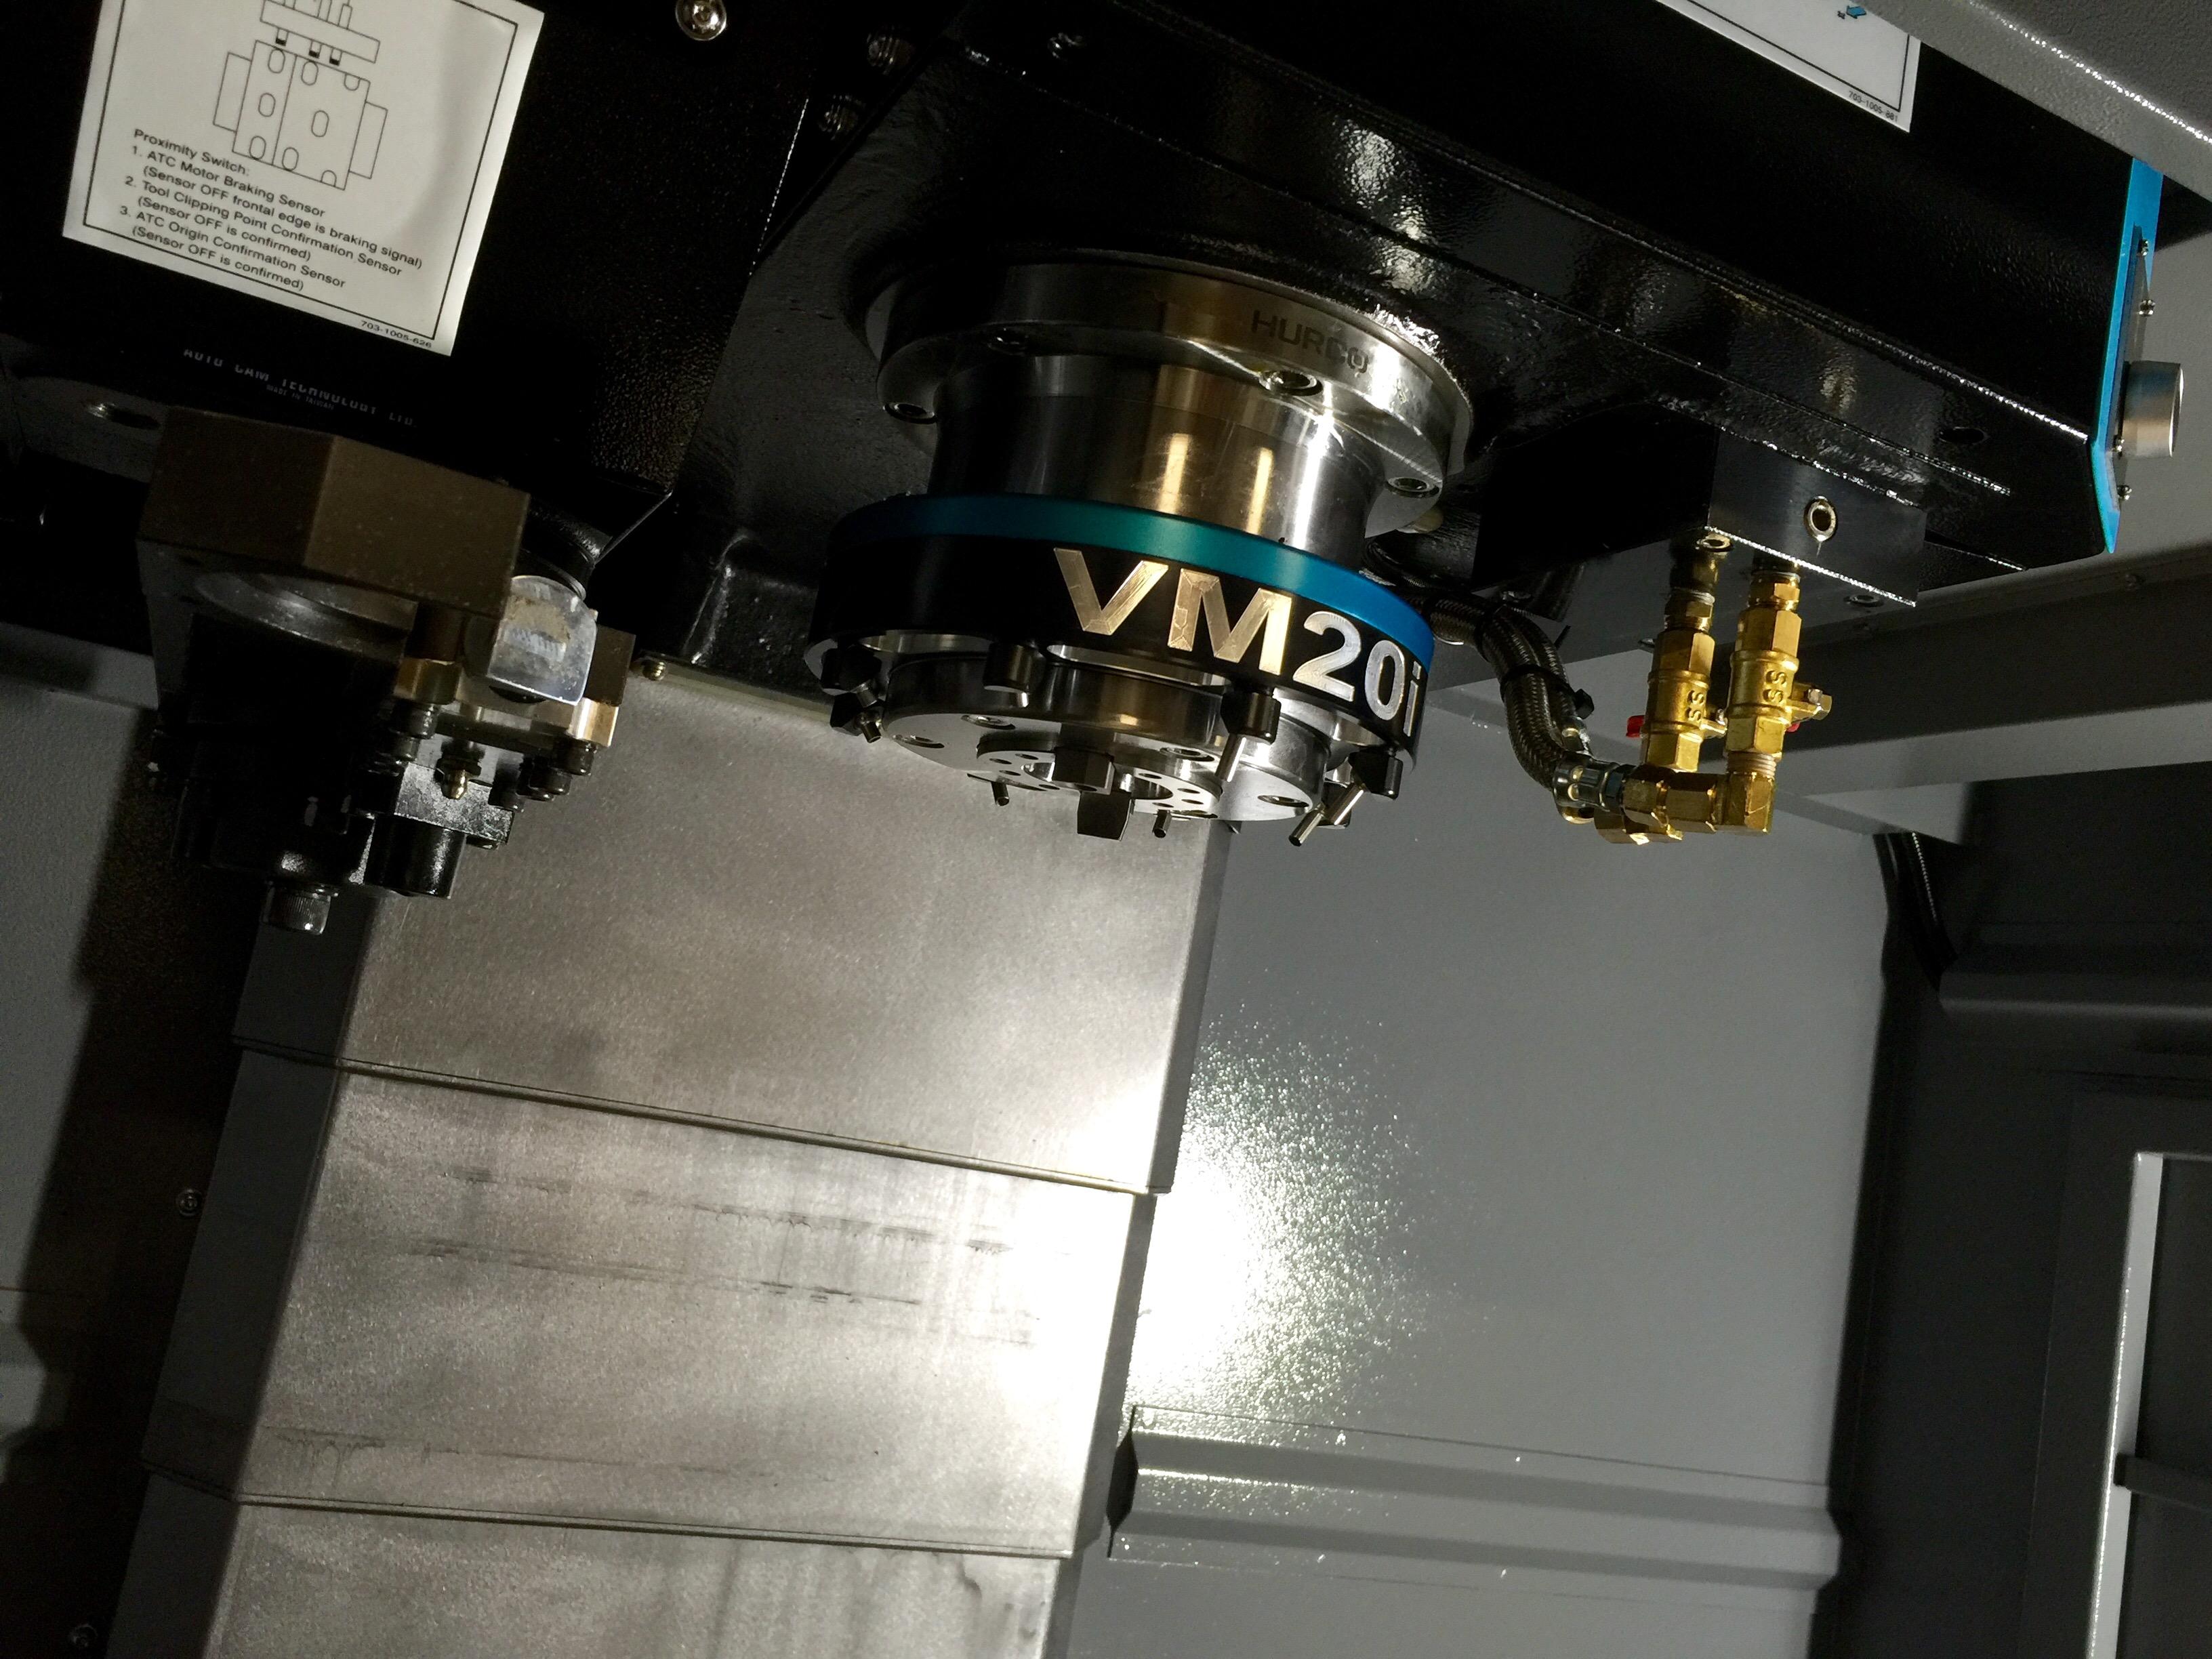 VM_Coolant_Ring_VM20i.jpg